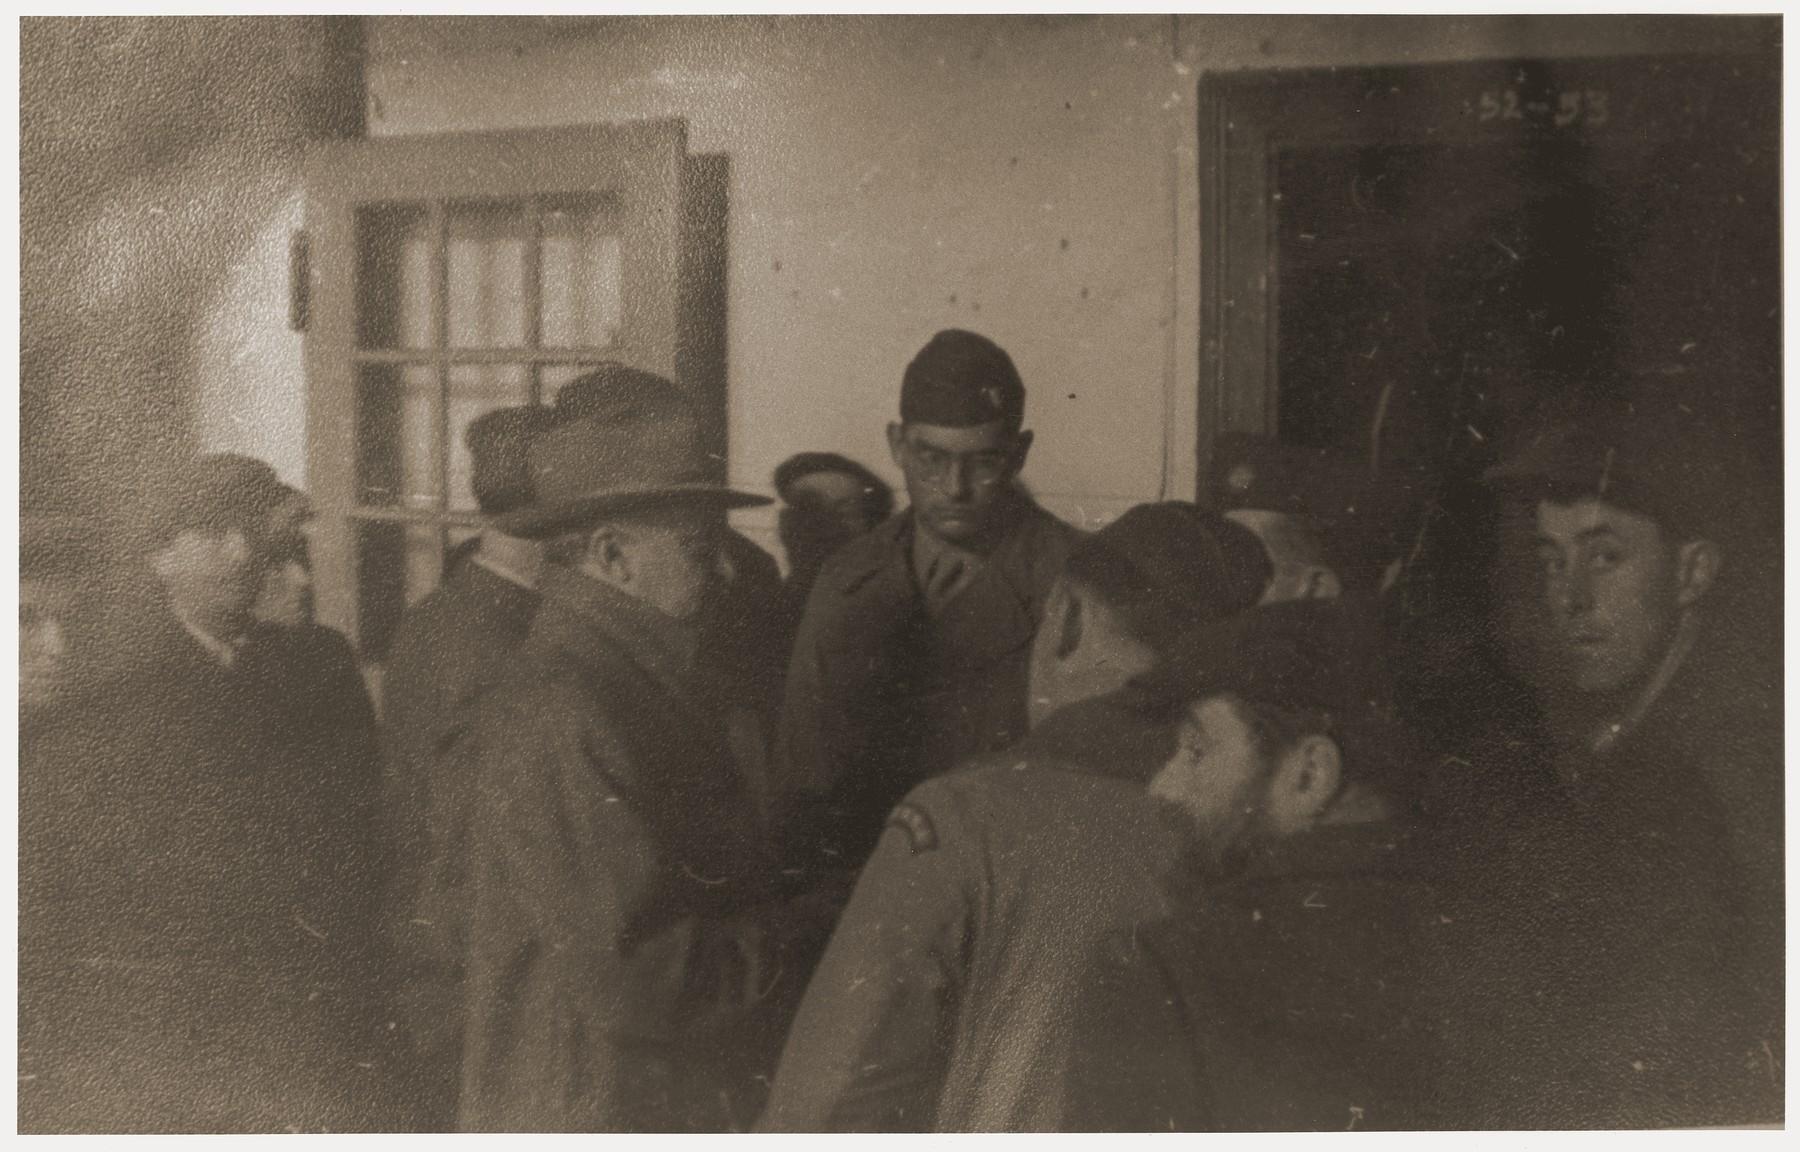 Chaplain Herbert Friedman (center, facing camera) and Philip Bernstein (center left, wearing fedora), Adviser on Jewish Affairs to General Joseph T. McNarney, visit the Berlin-Schlachtensee DP camp.